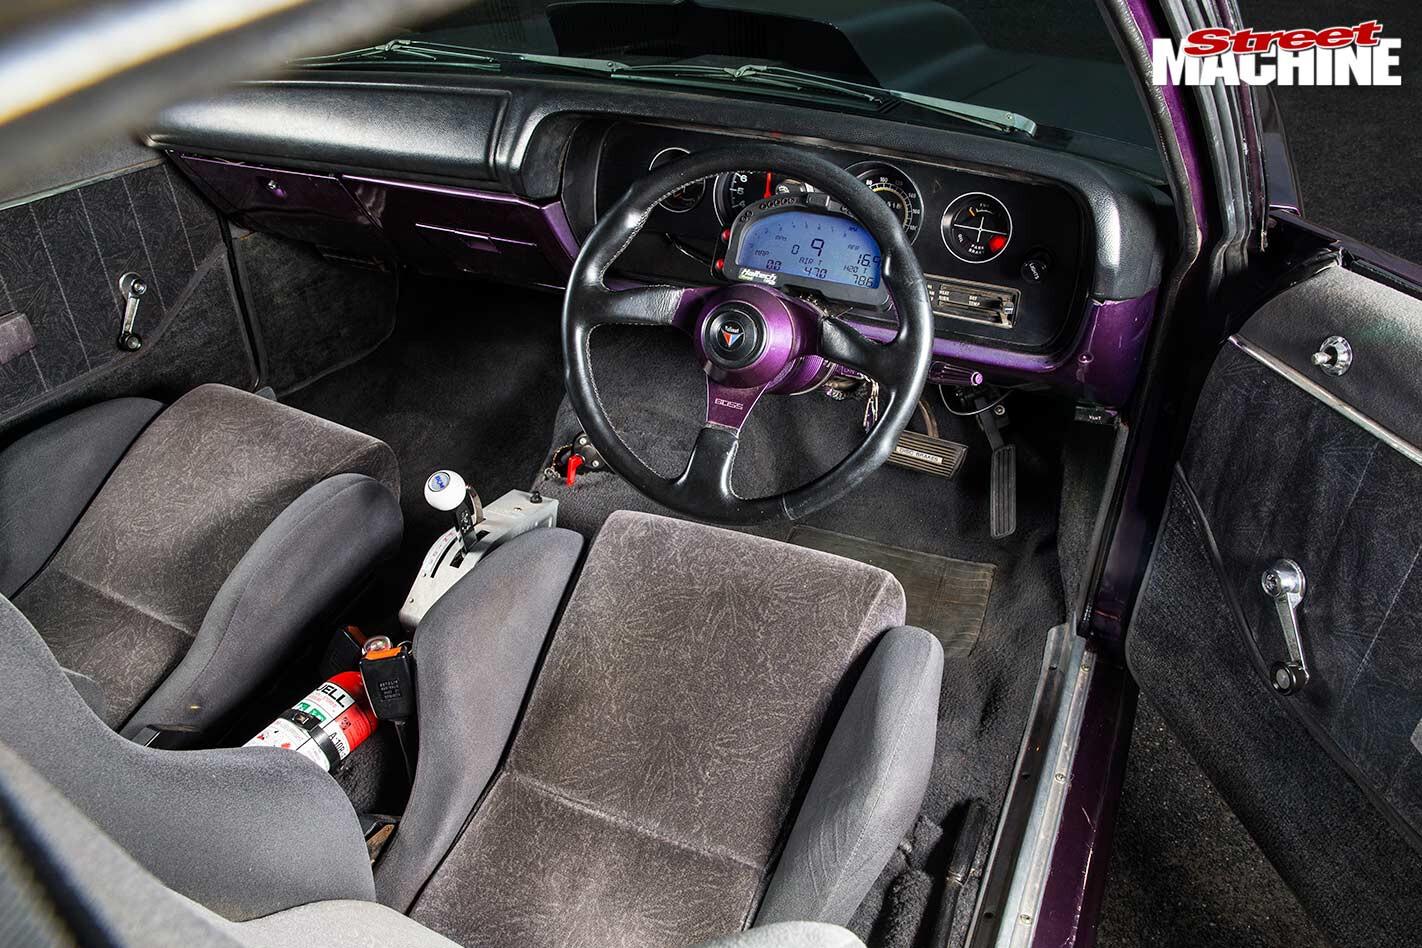 Chrysler VH Charger interior